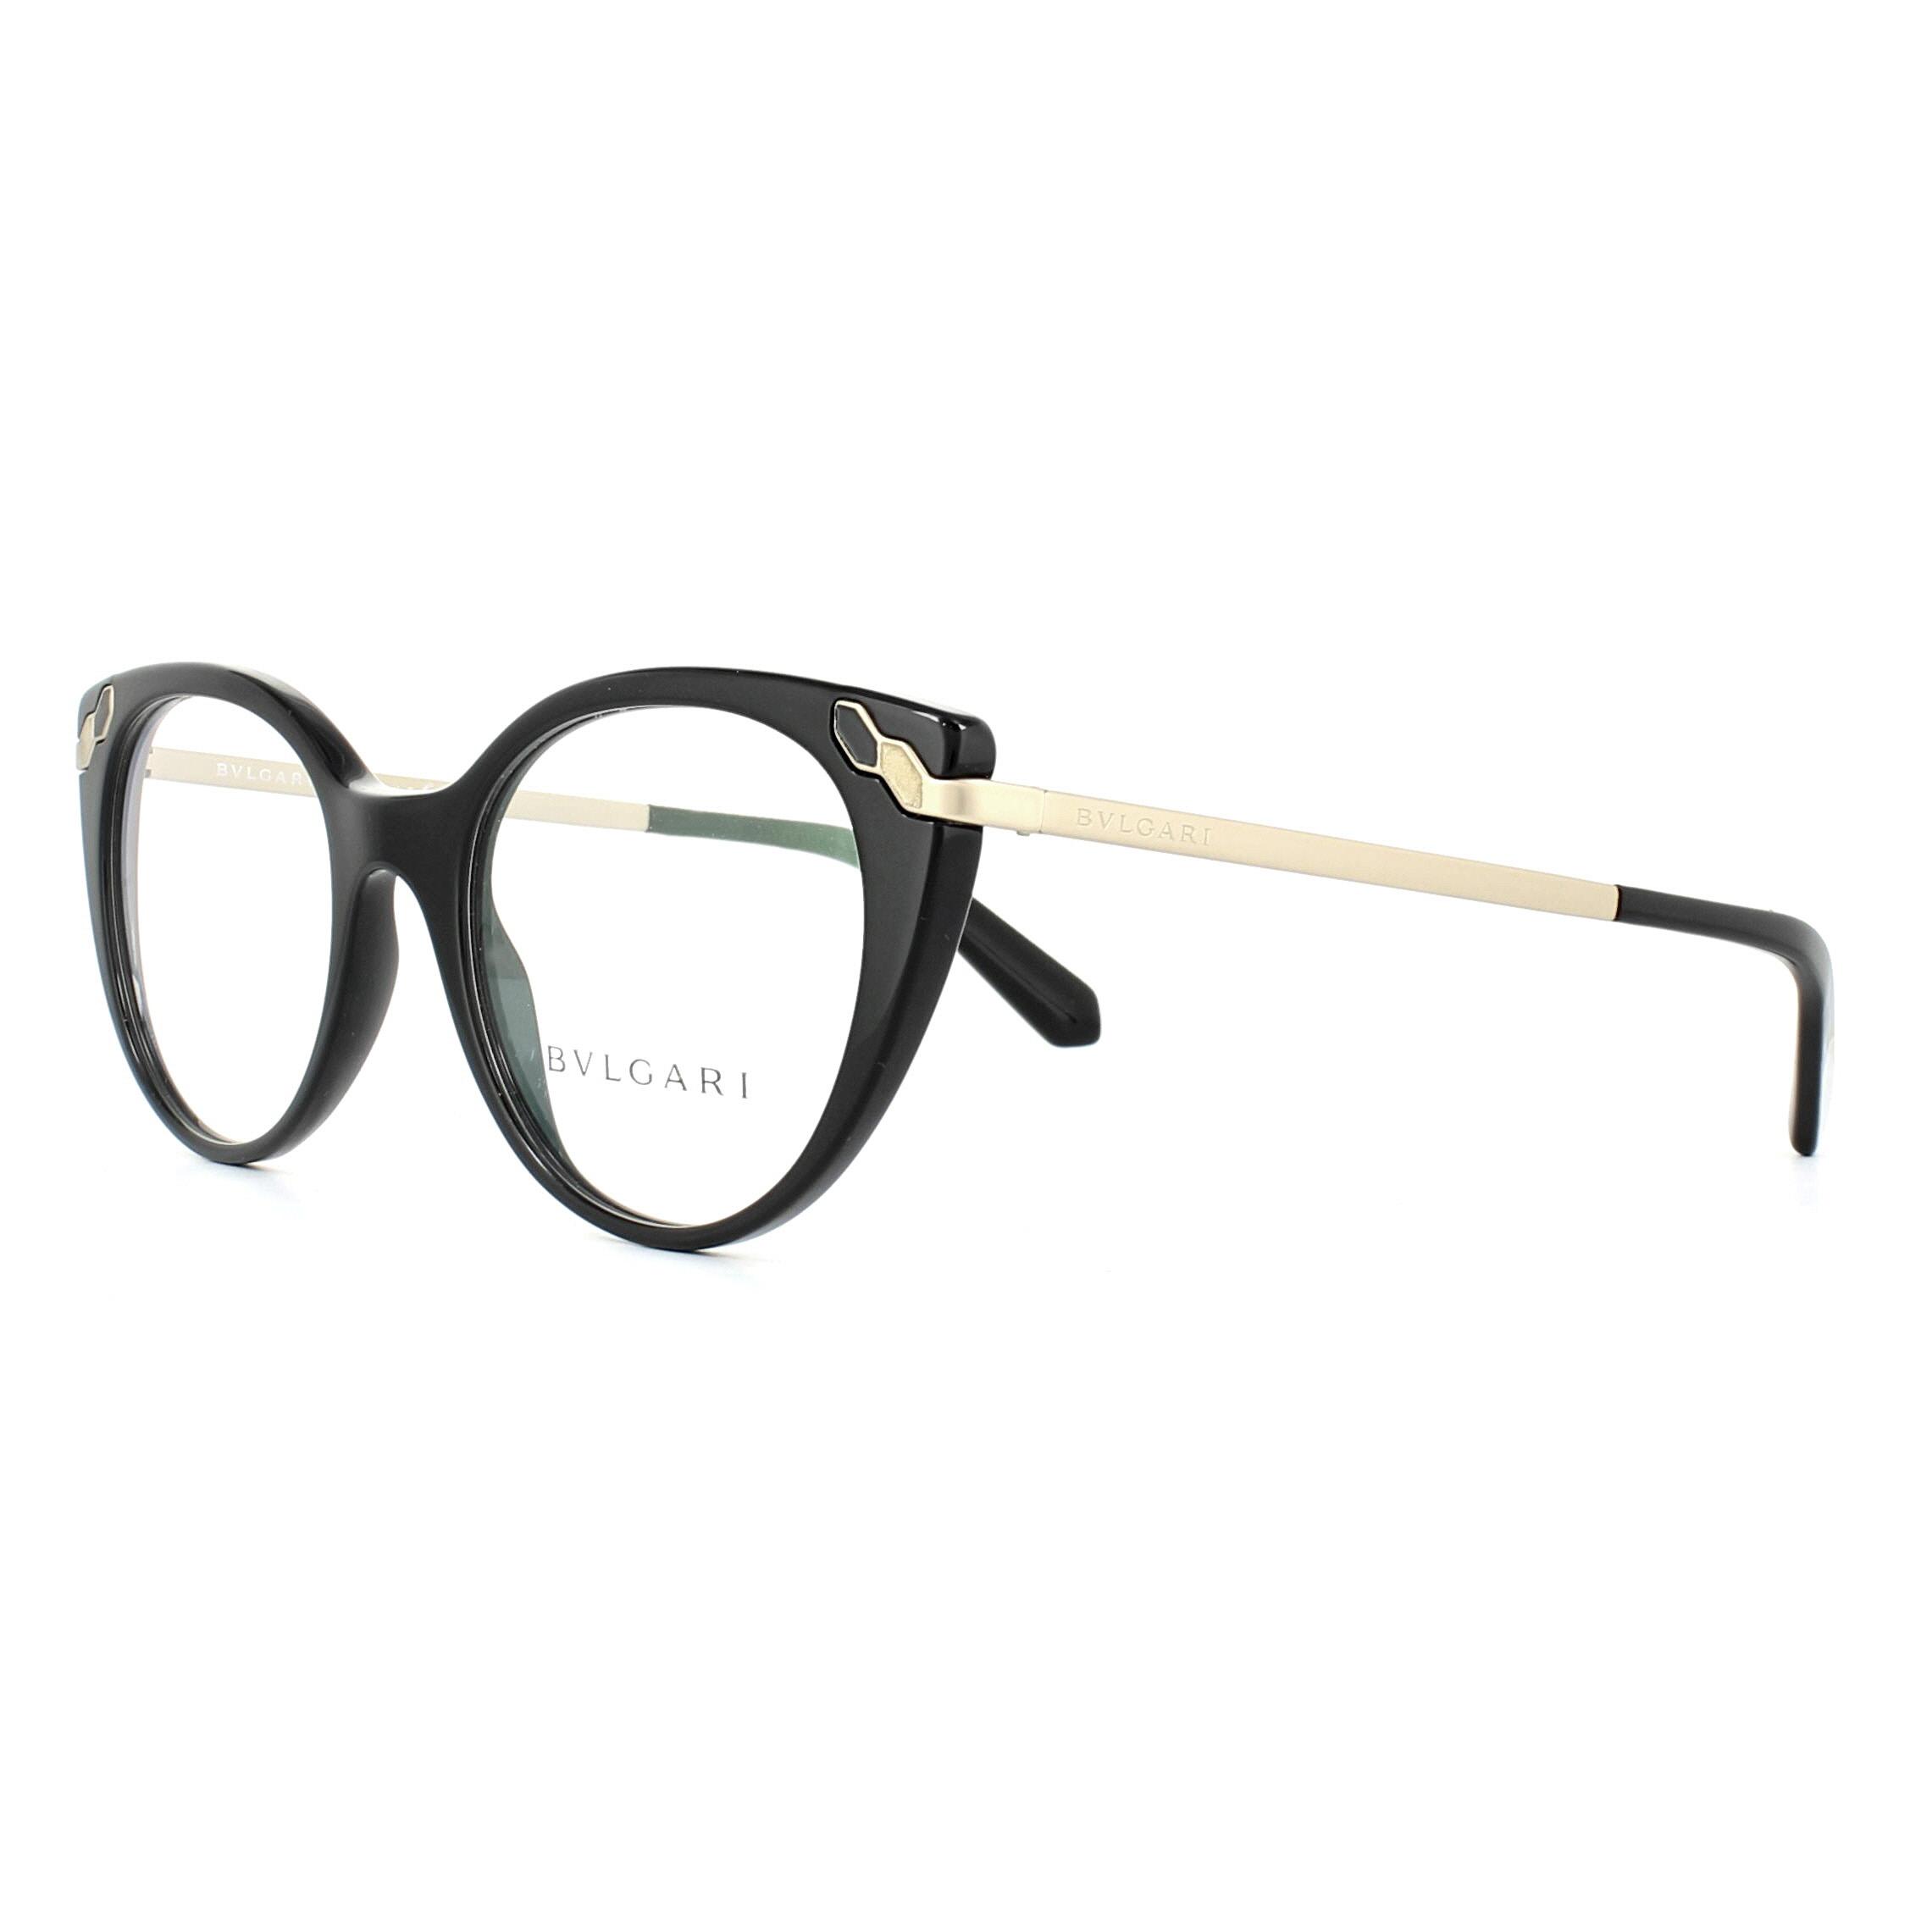 Bvlgari Glasses Frames 4150 501 Black 49mm Womens 8053672811537 | eBay